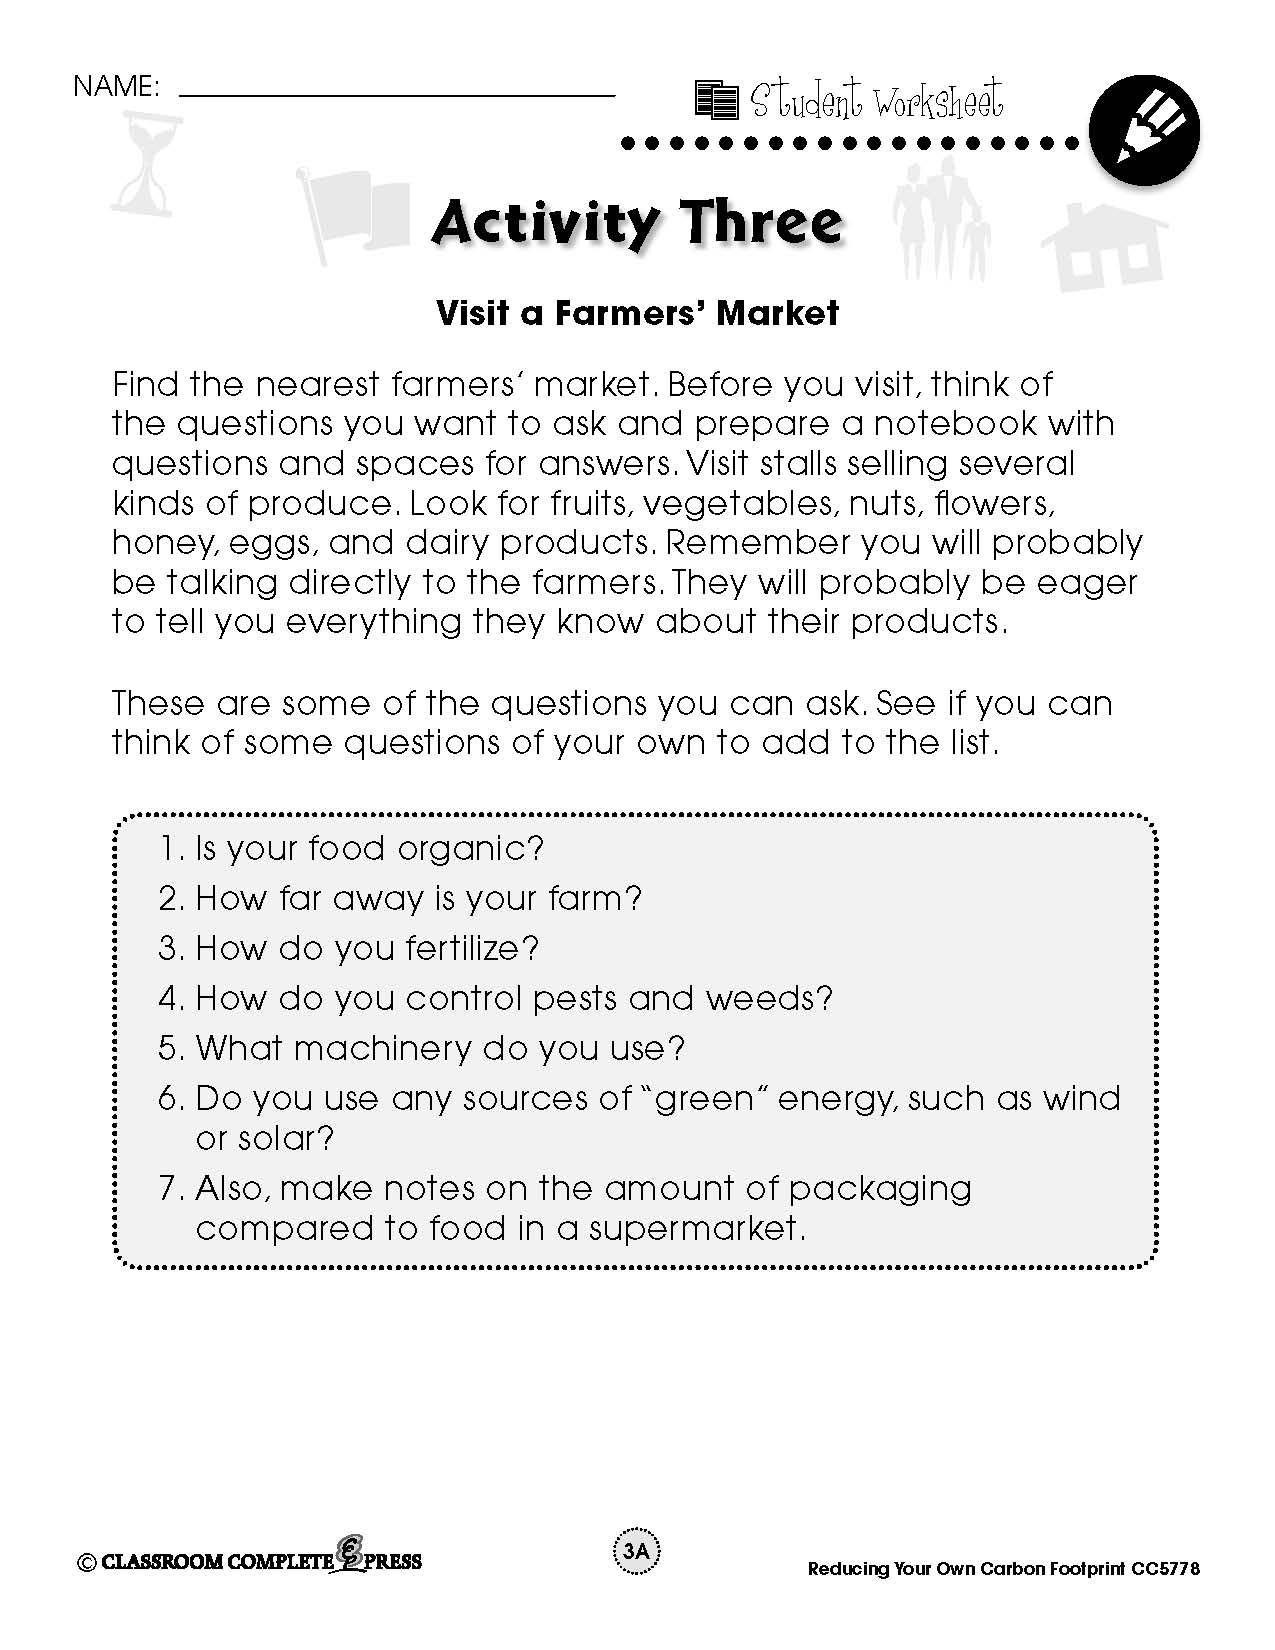 Personal Ecological Footprint Worksheet